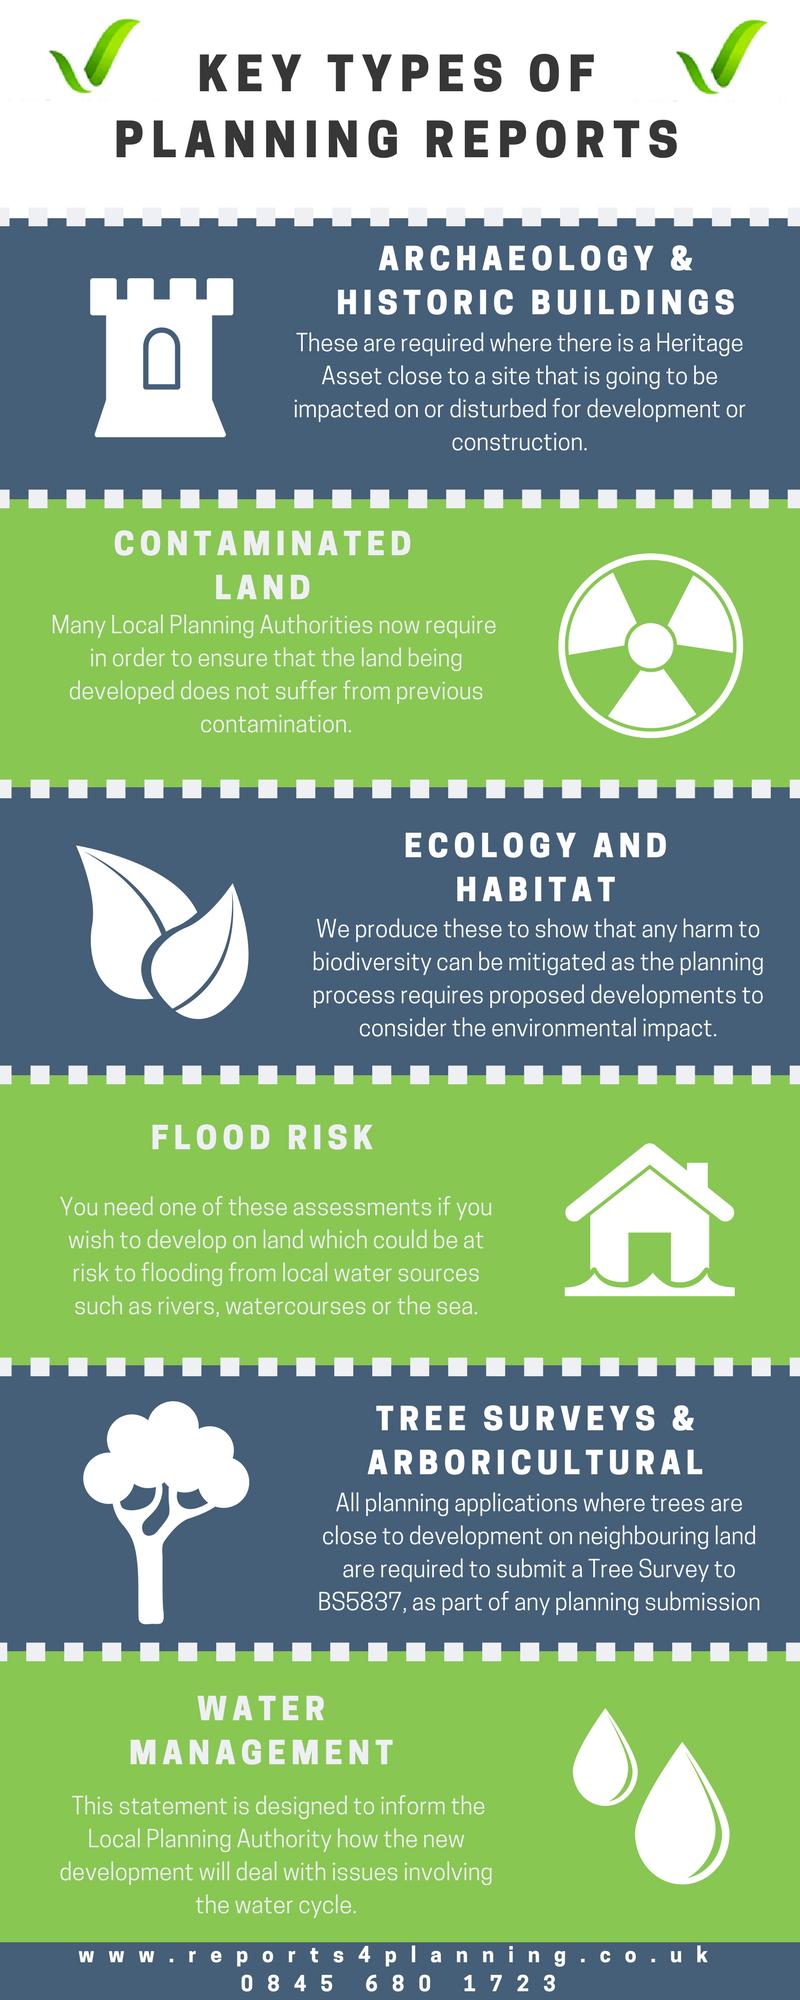 planning-reports-types-infographic-lkrllc